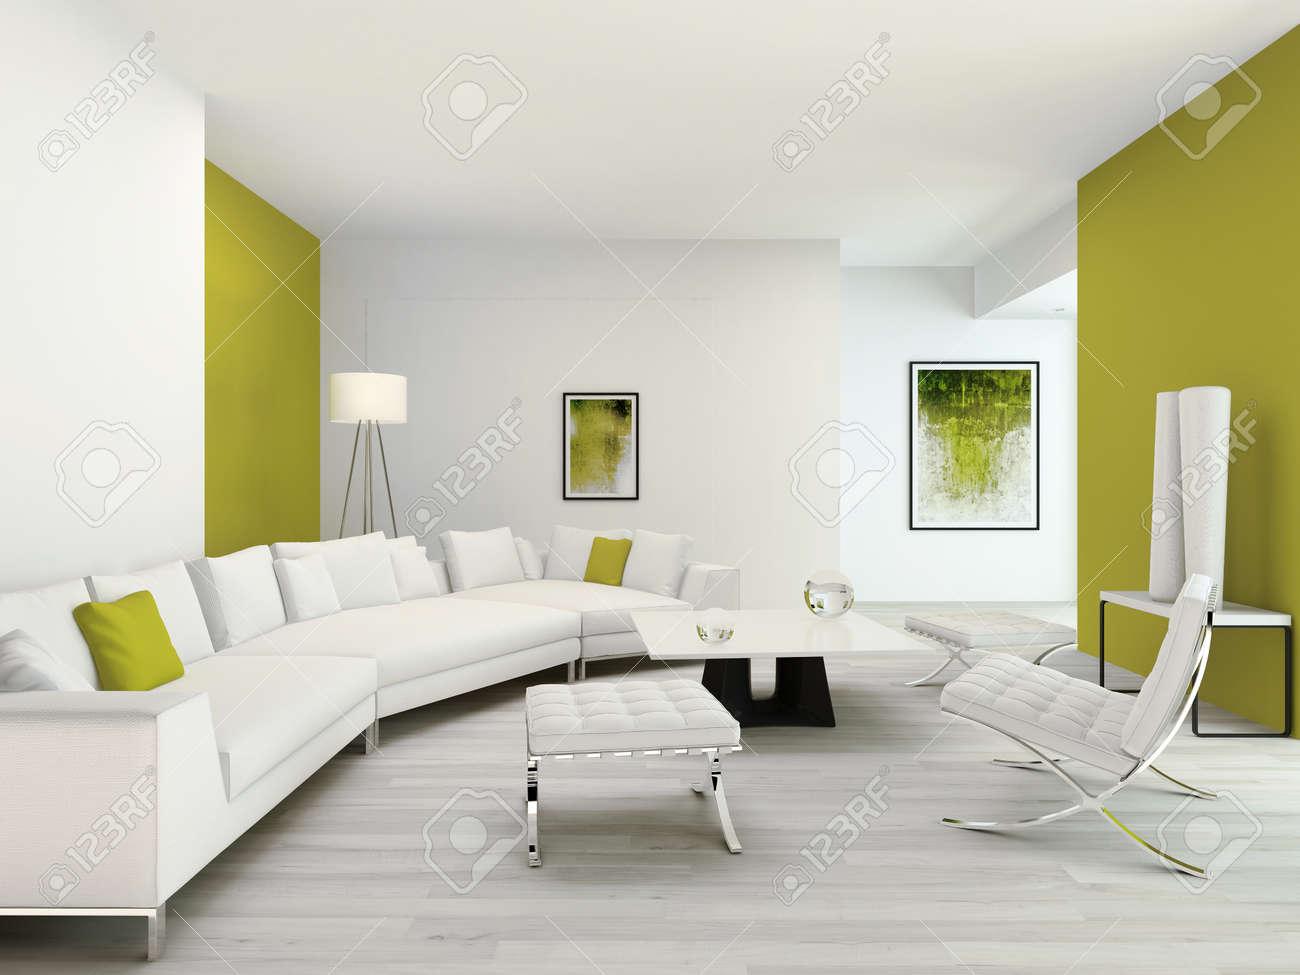 Muebles De Interior Modernos Latest With Muebles De Interior  # Muebles Lujosos Y Modernos